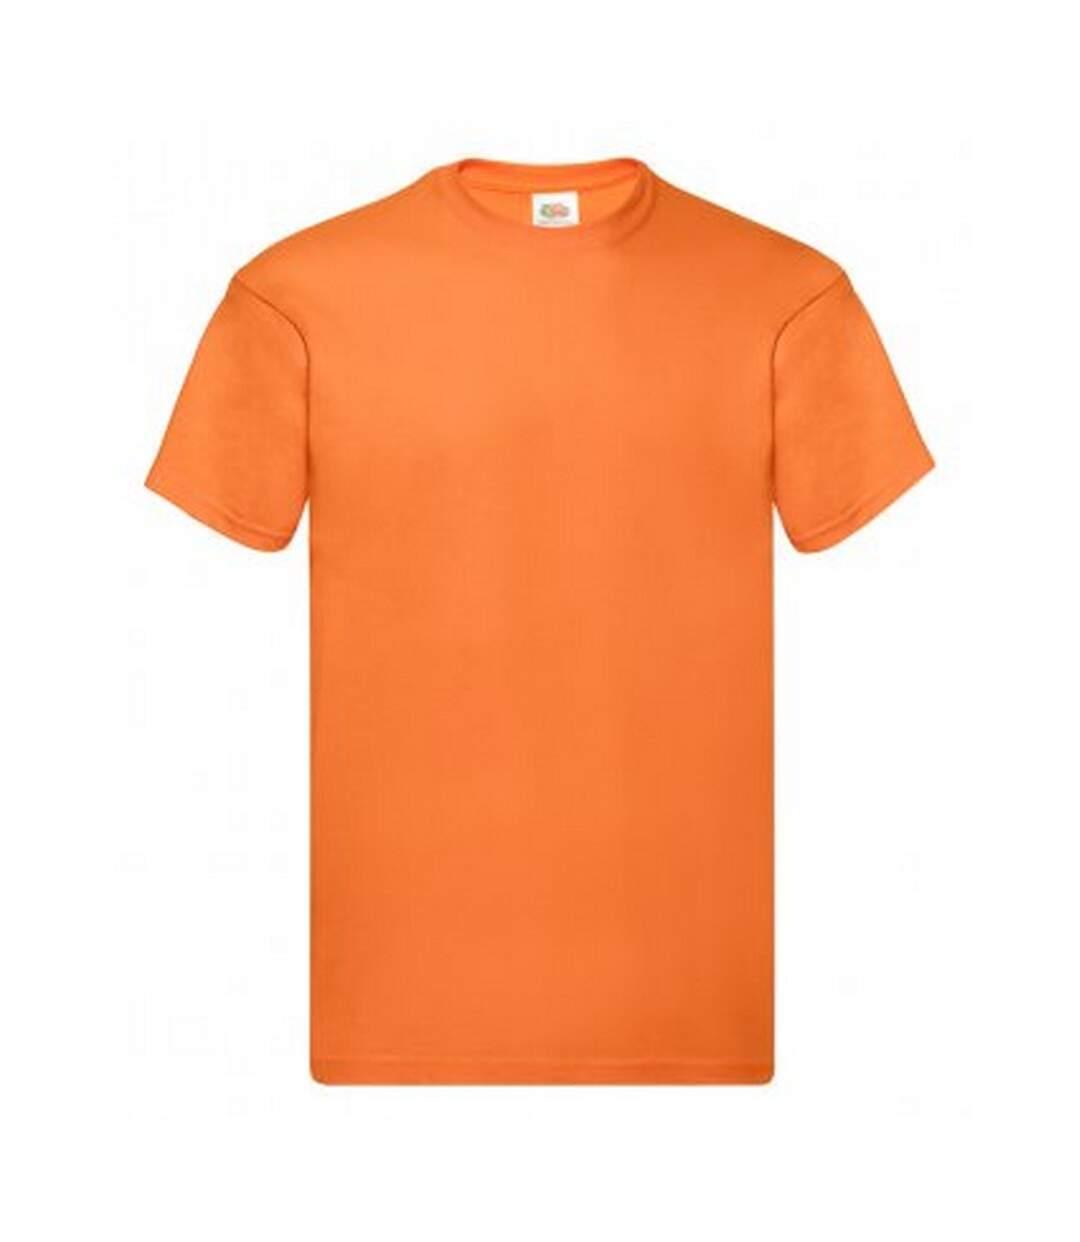 Fruit Of The Loom Mens Original Short Sleeve T-Shirt (Orange) - UTPC124